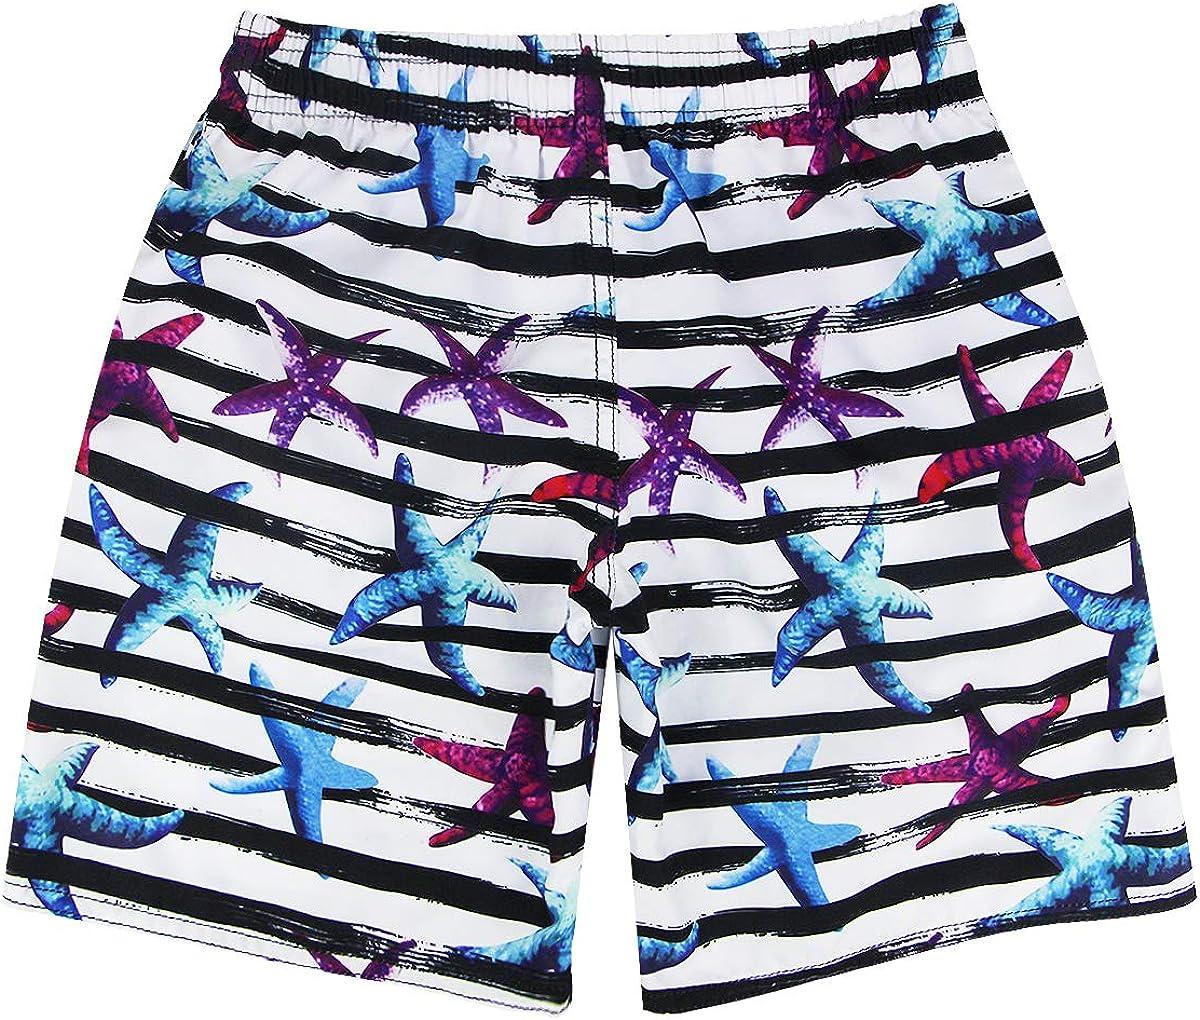 QRANSS Boys Swim Trunks Elastic Waistband Beach Shorts with Drawstring